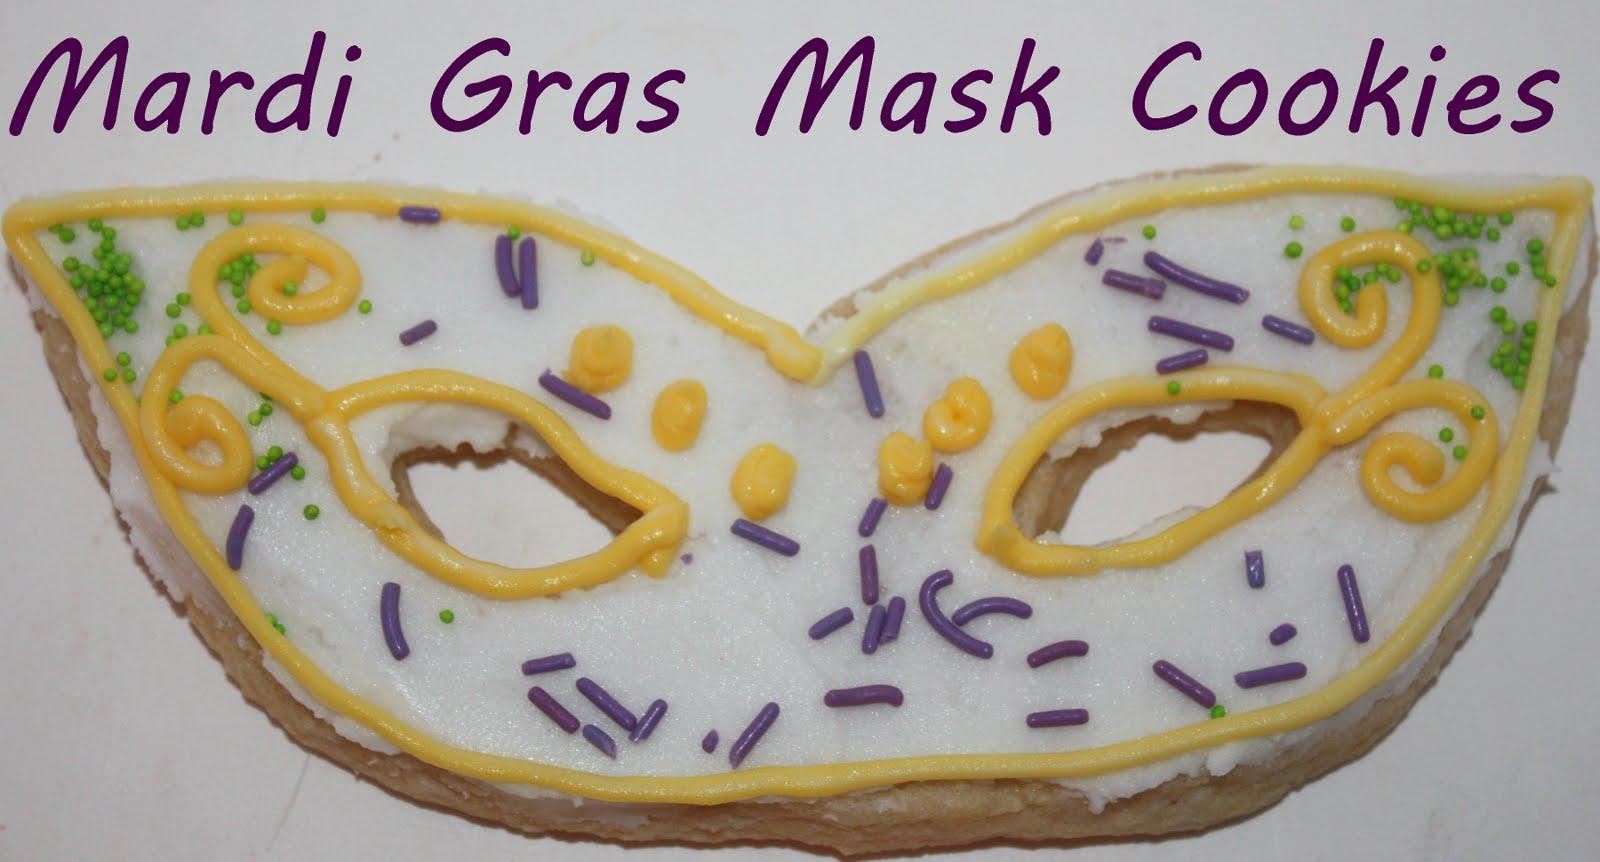 Mardi Gras Mask Cookie Cutter